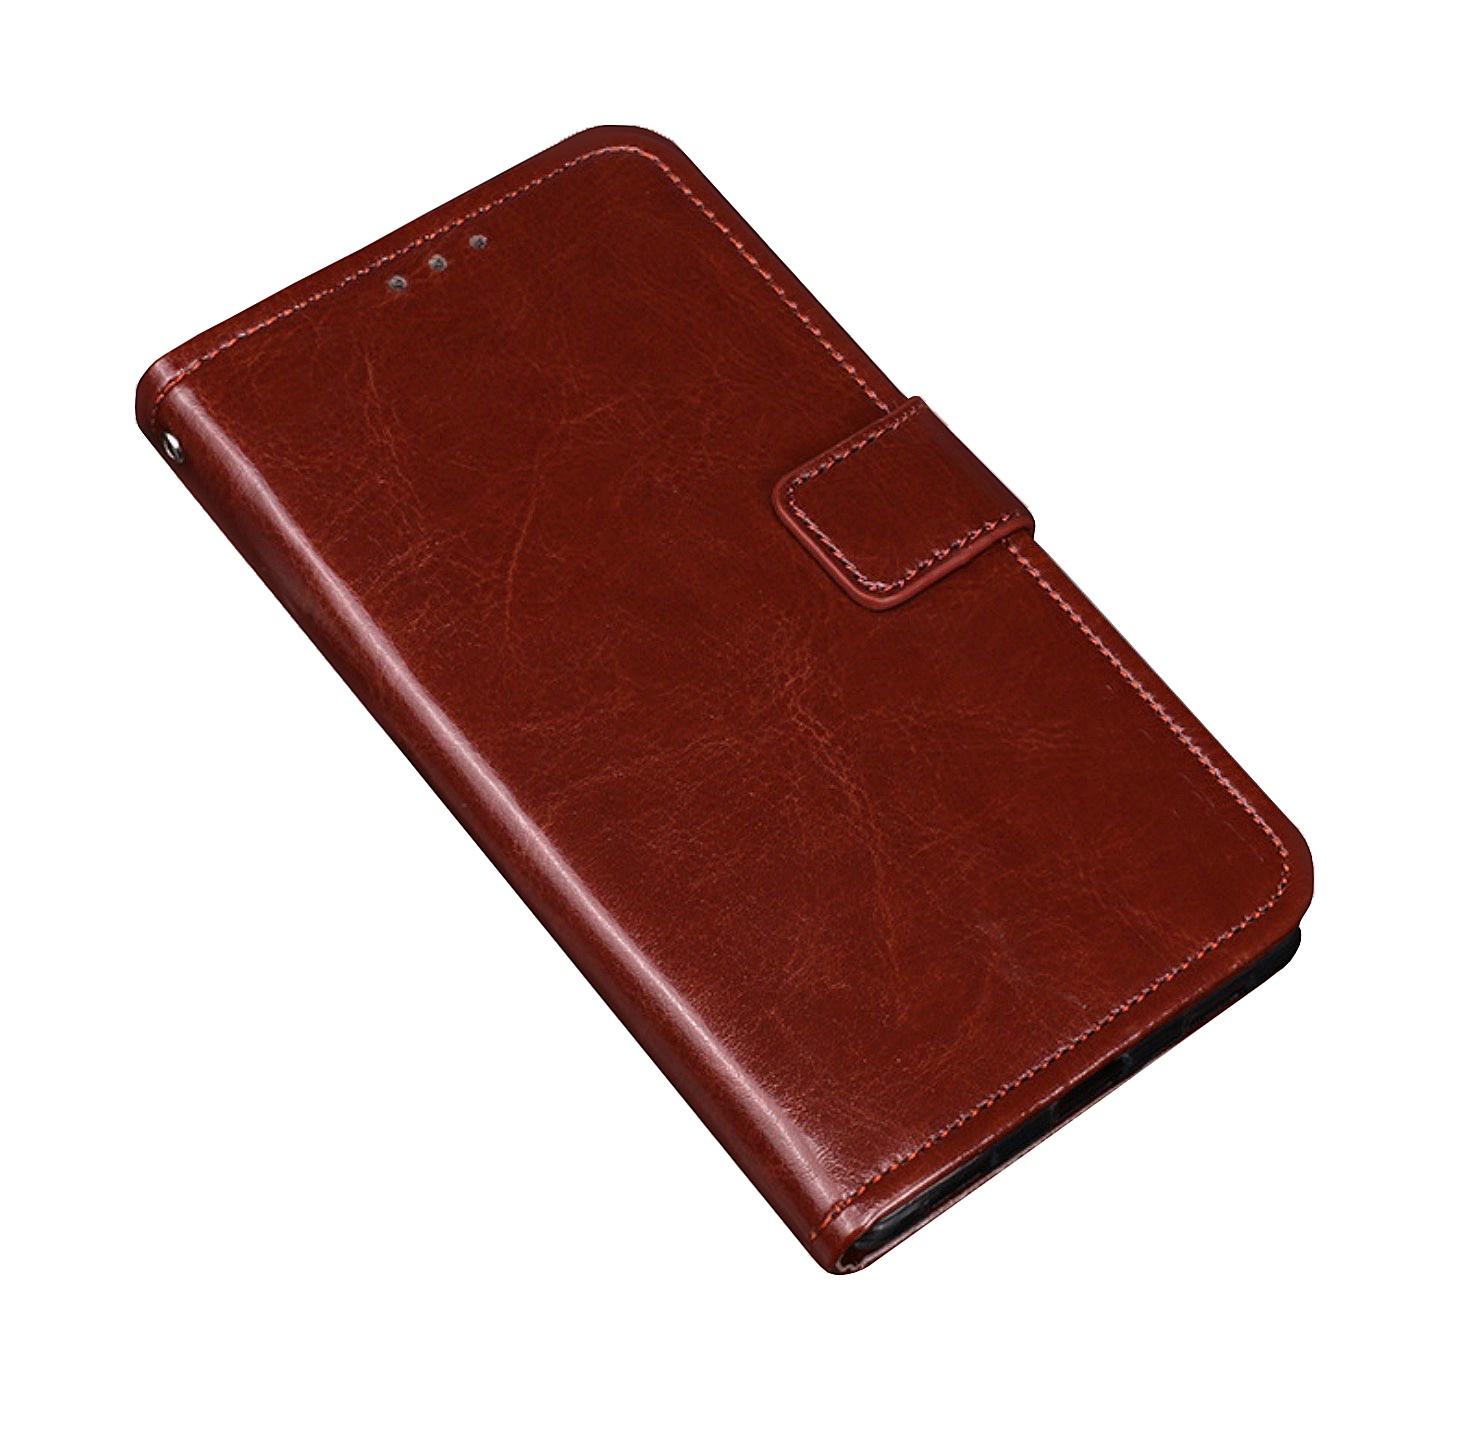 купить Чехол-книжка MyPads для ZTE Nubia Z17 miniS с мульти-подставкой застёжкой и визитницей коричневый онлайн